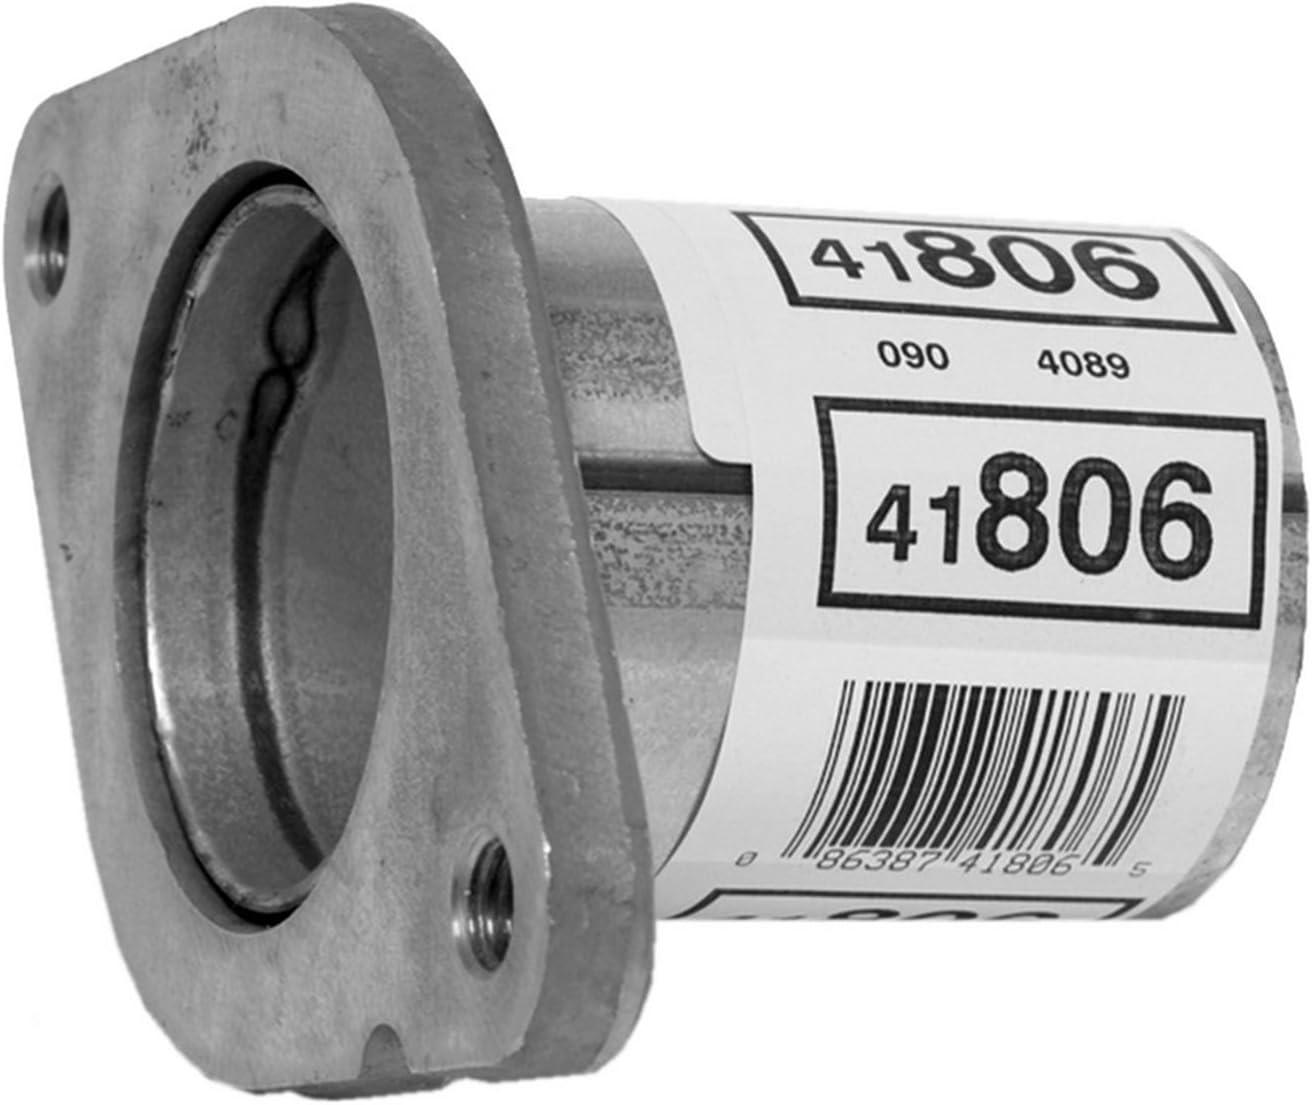 Dynomax 41806 Exhaust Intermediate Pipe 710hzfDCPkL